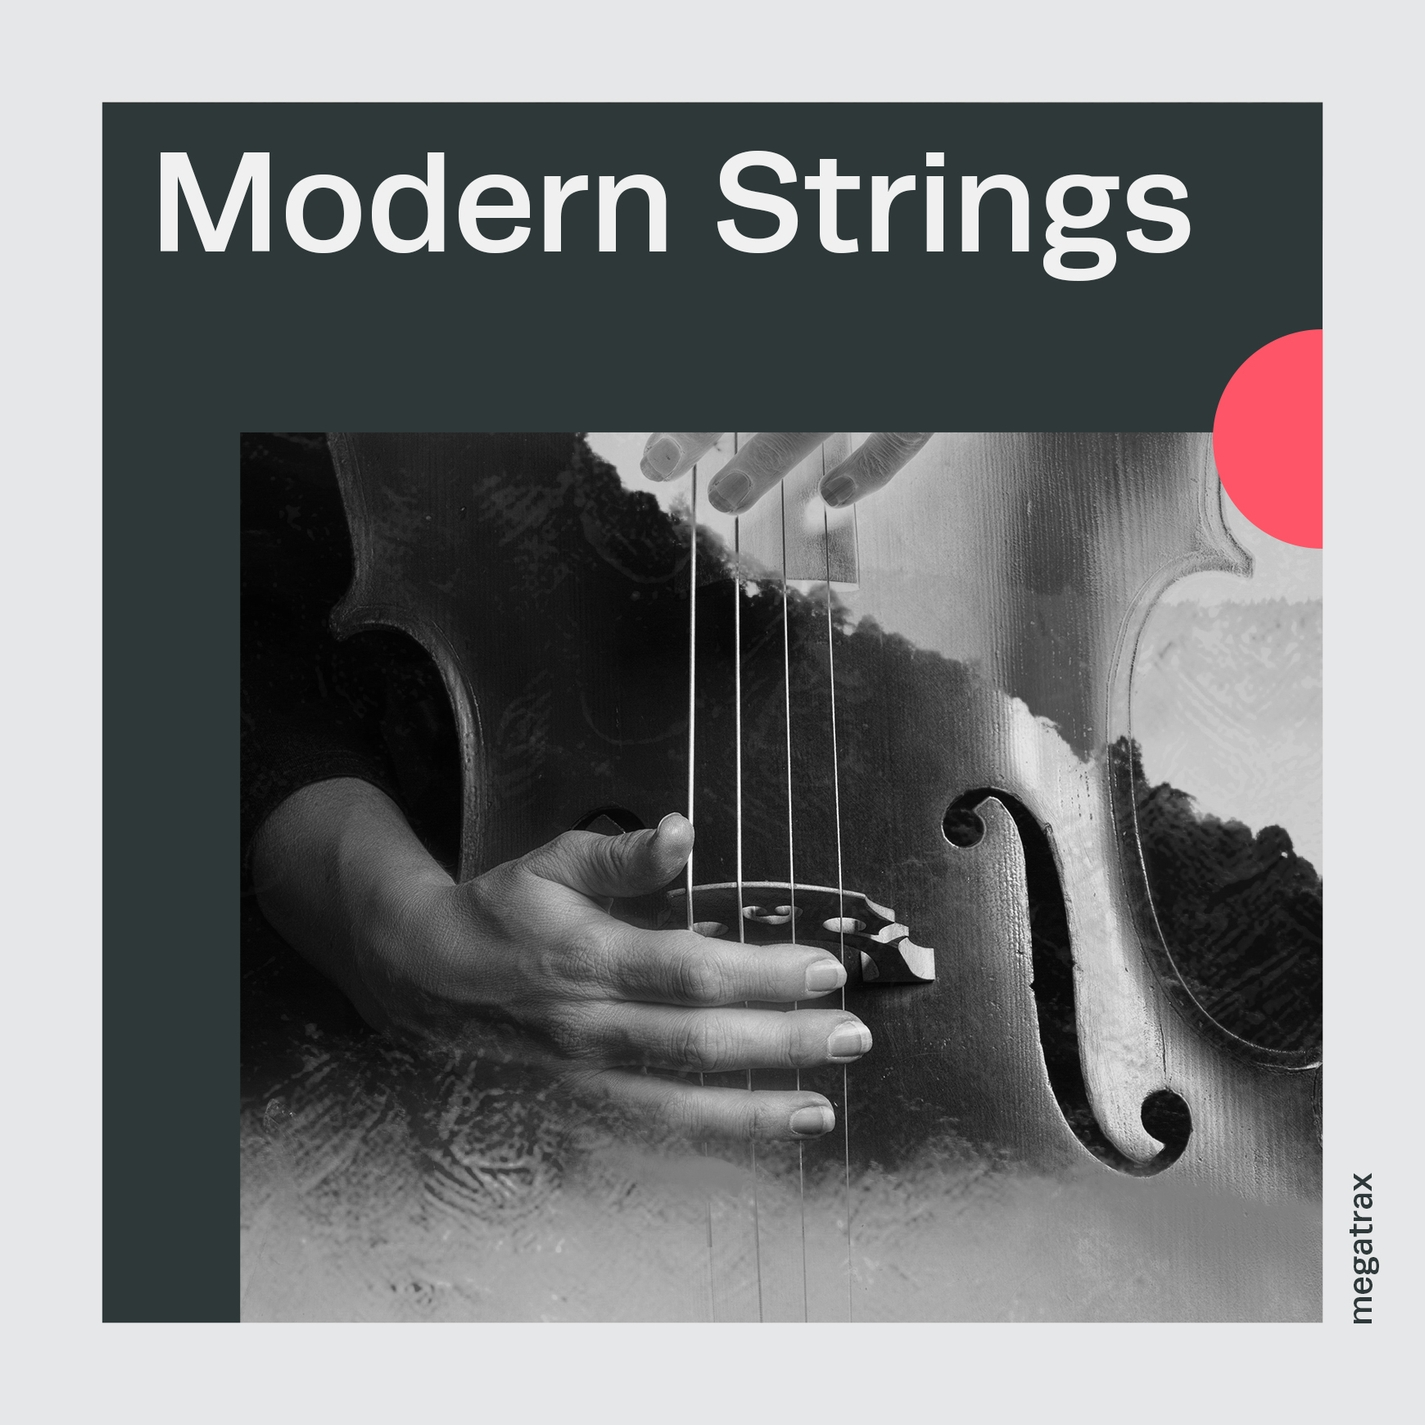 Modern Strings